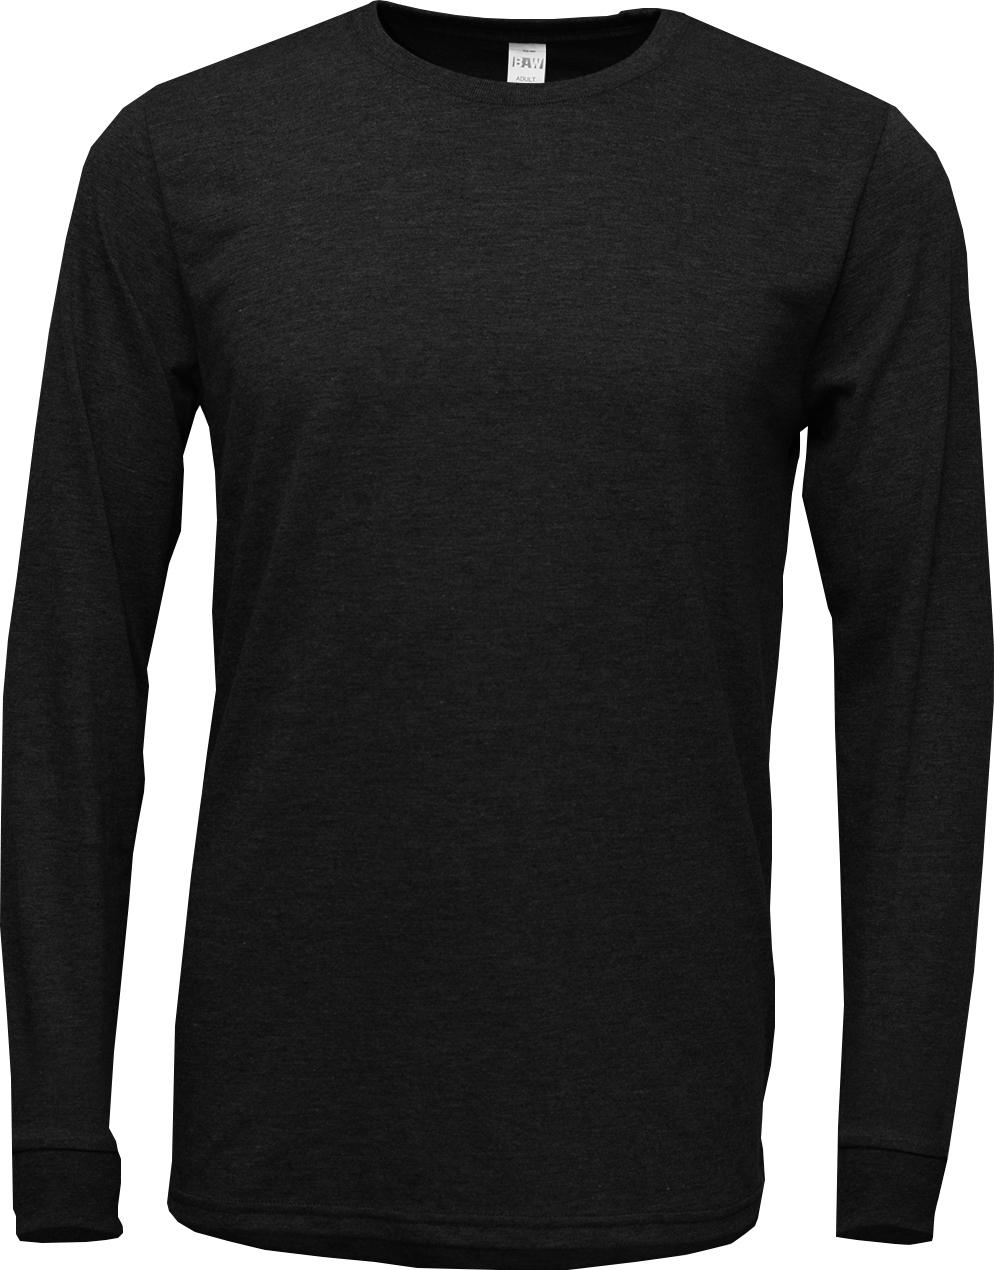 BAW Athletic Wear TR92 - Unisex Tri-Blend T-Shirt Long Sleeve